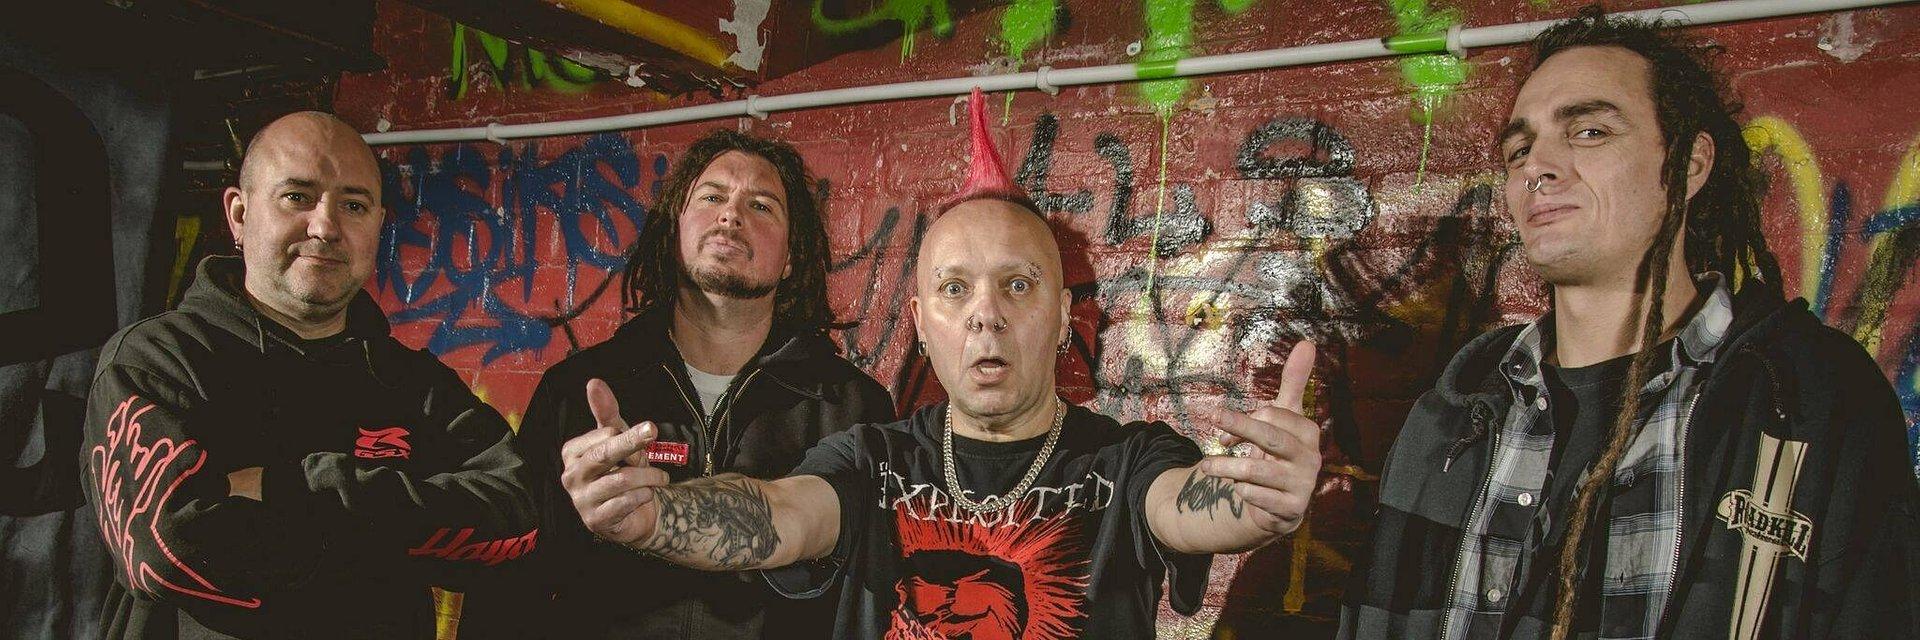 Punk nie umarł - ma się dobrze! The Exploited na Pol'and'Rock Festival.